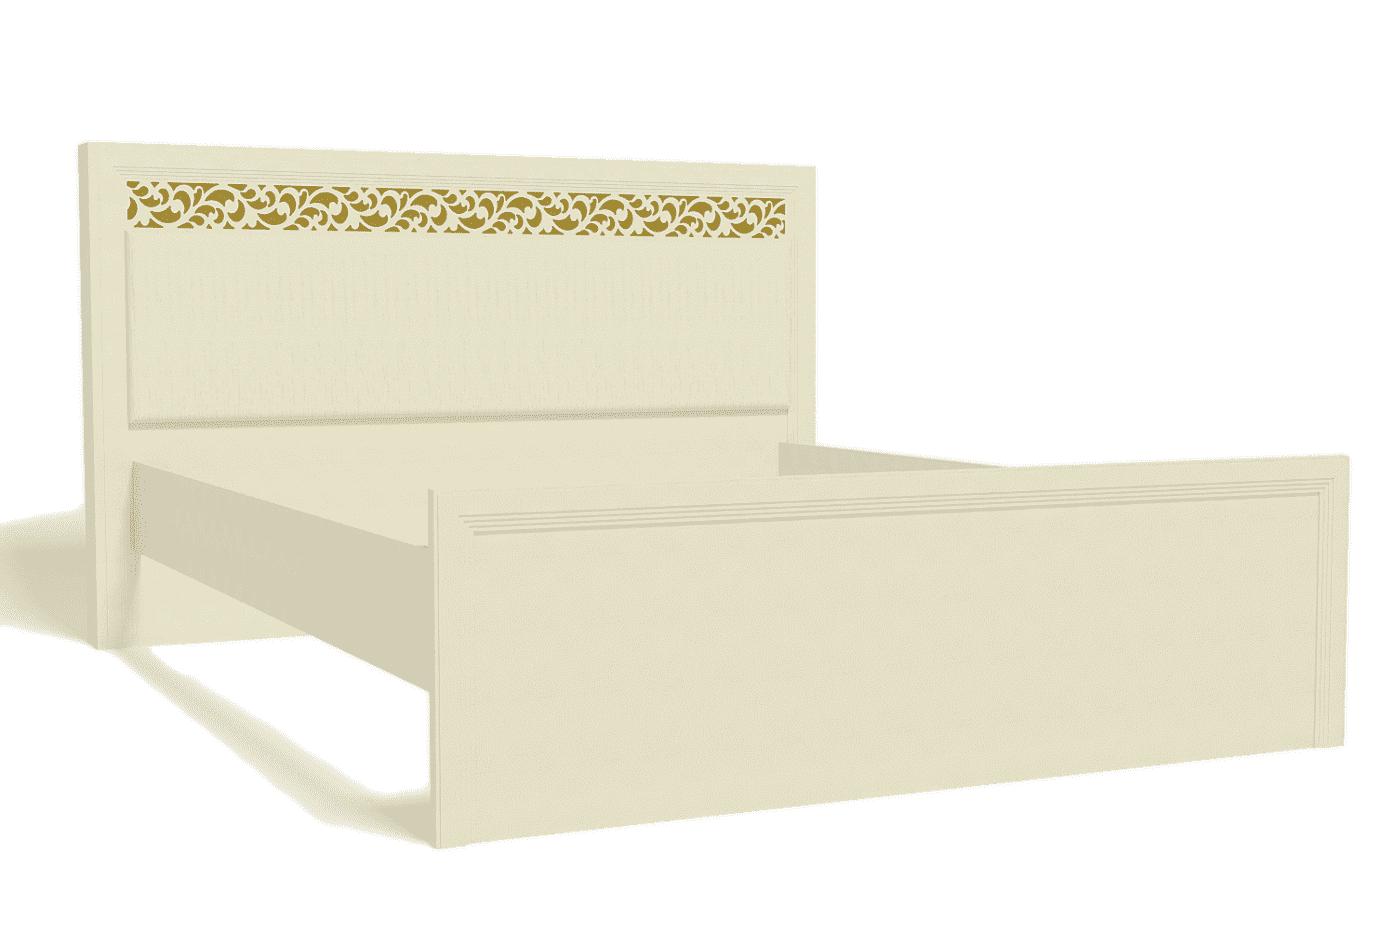 Спальня Ливадия Комплект 3 - фото Кровать Ливадия Л8б 180*200 см, без ортопеда, без матраса